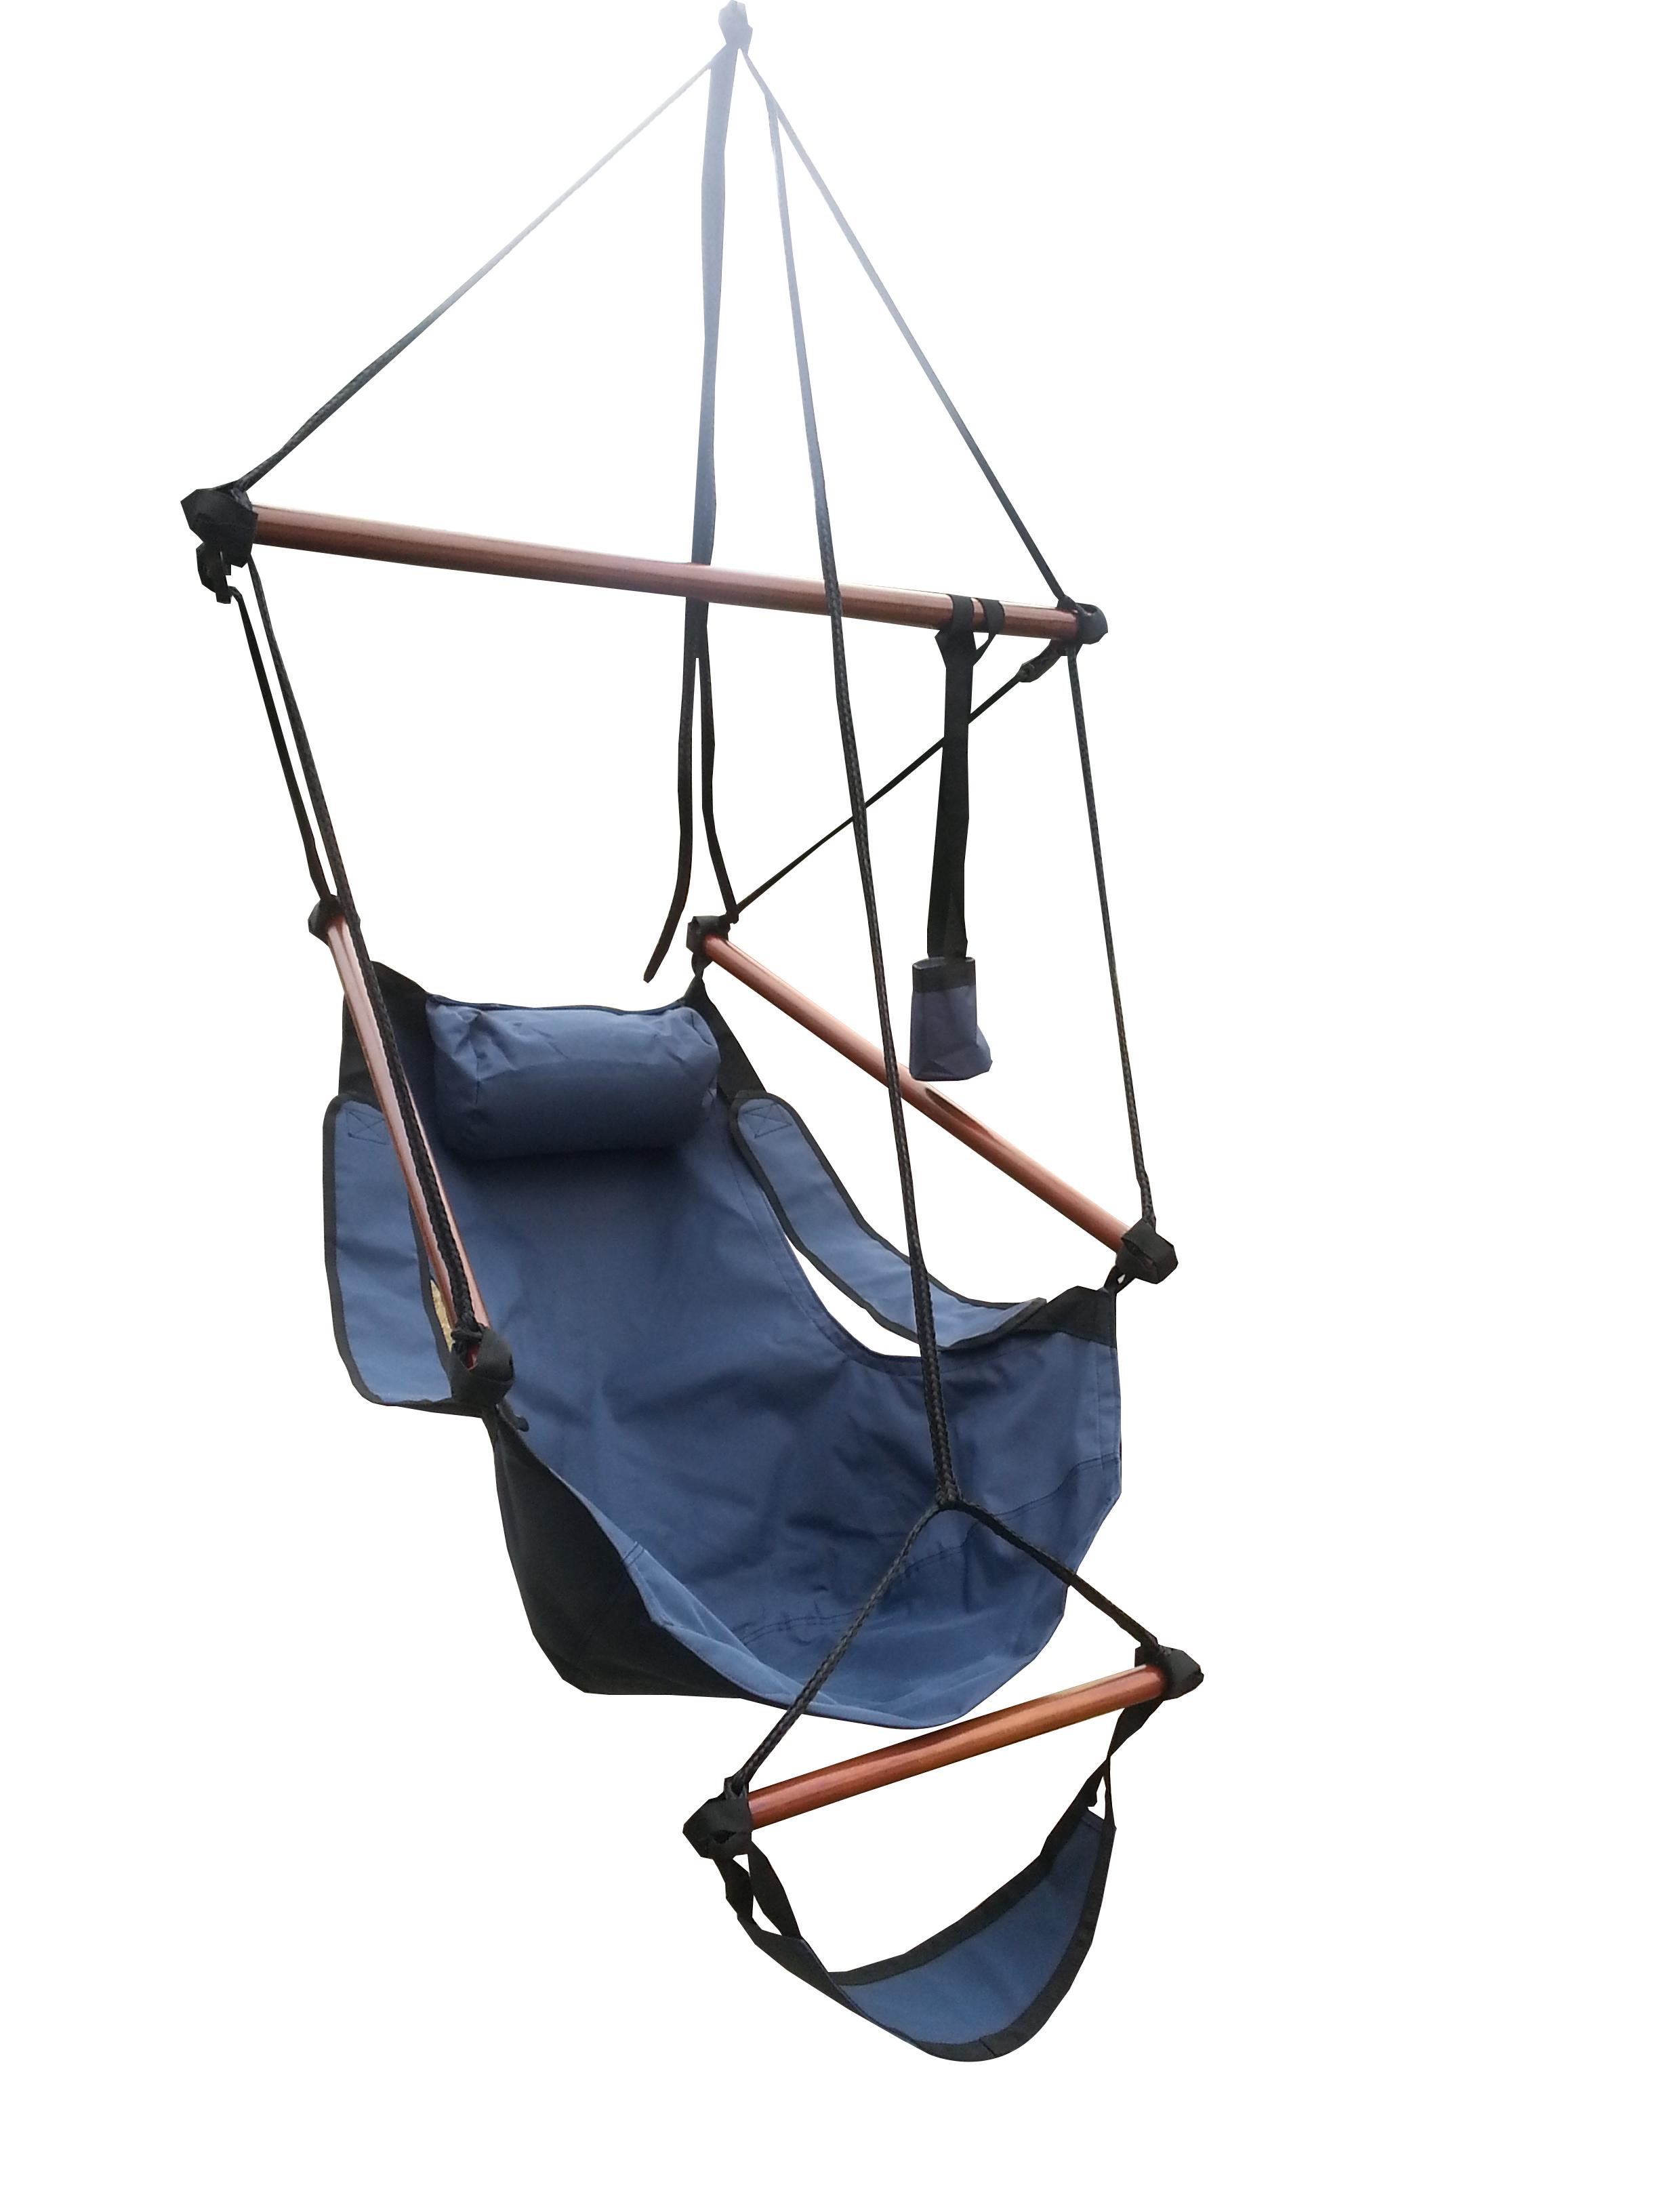 Palm springs sky air swing lounger hammock hanging chair w for Hanging chair spring